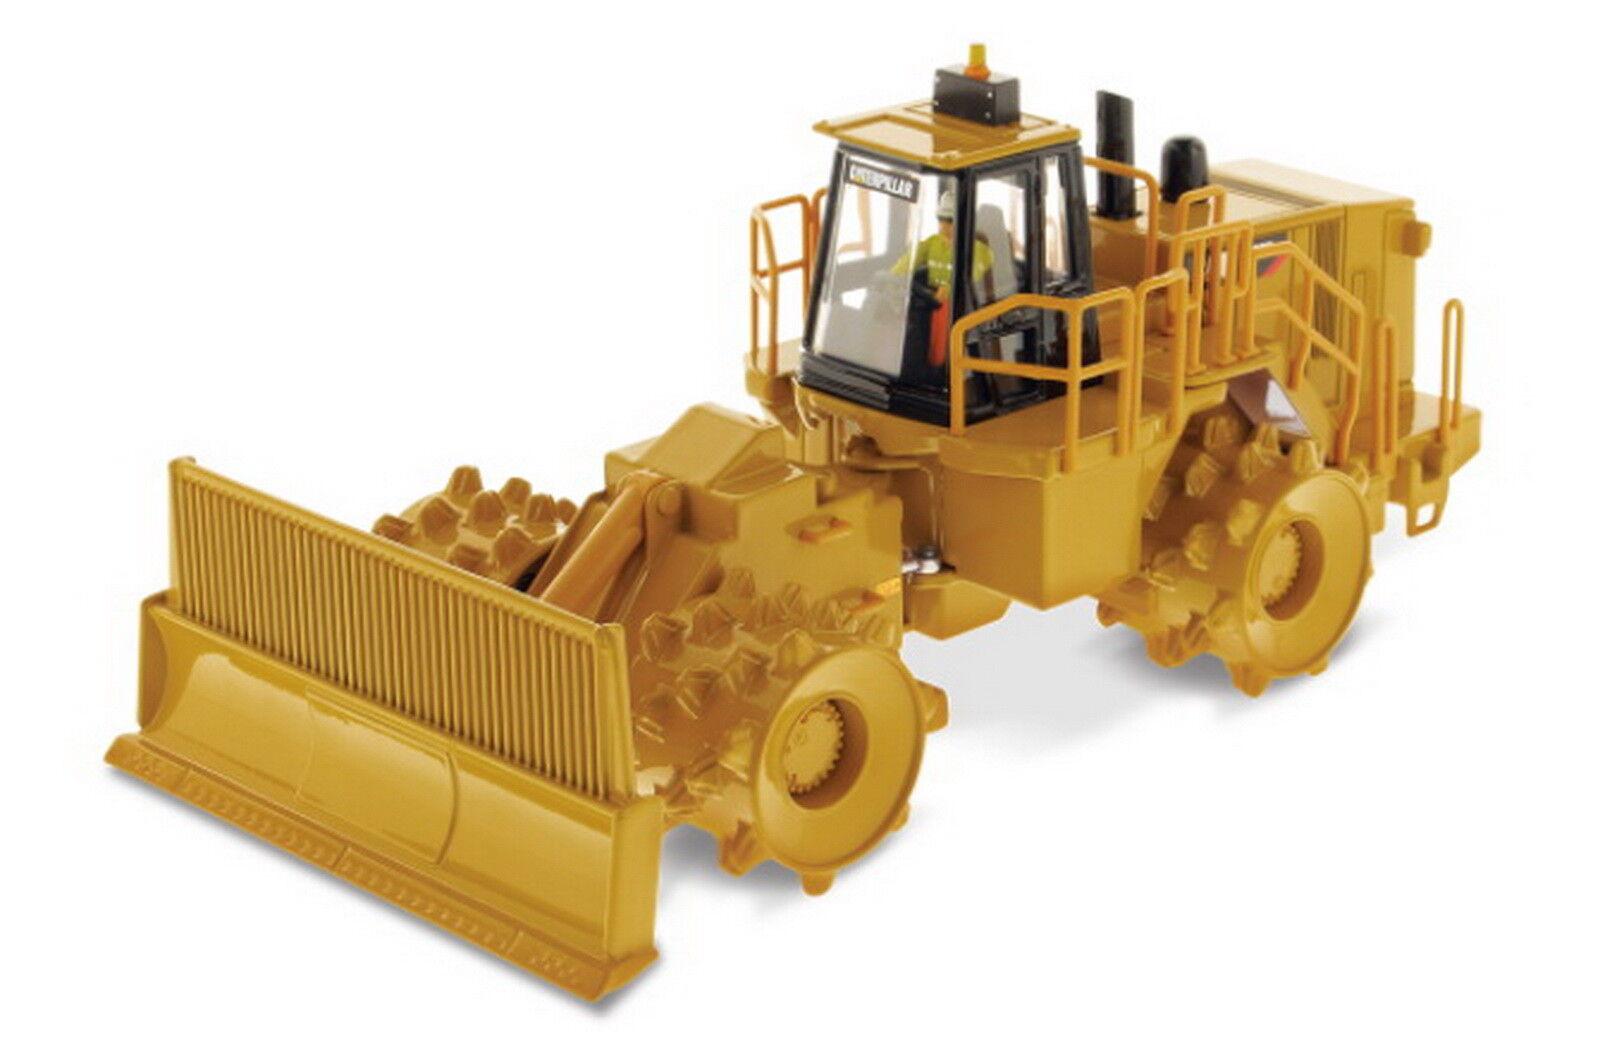 1 50 DM Caterpillar Cat 836H Landfill Compactor Diecast Model  85205    Kaufen